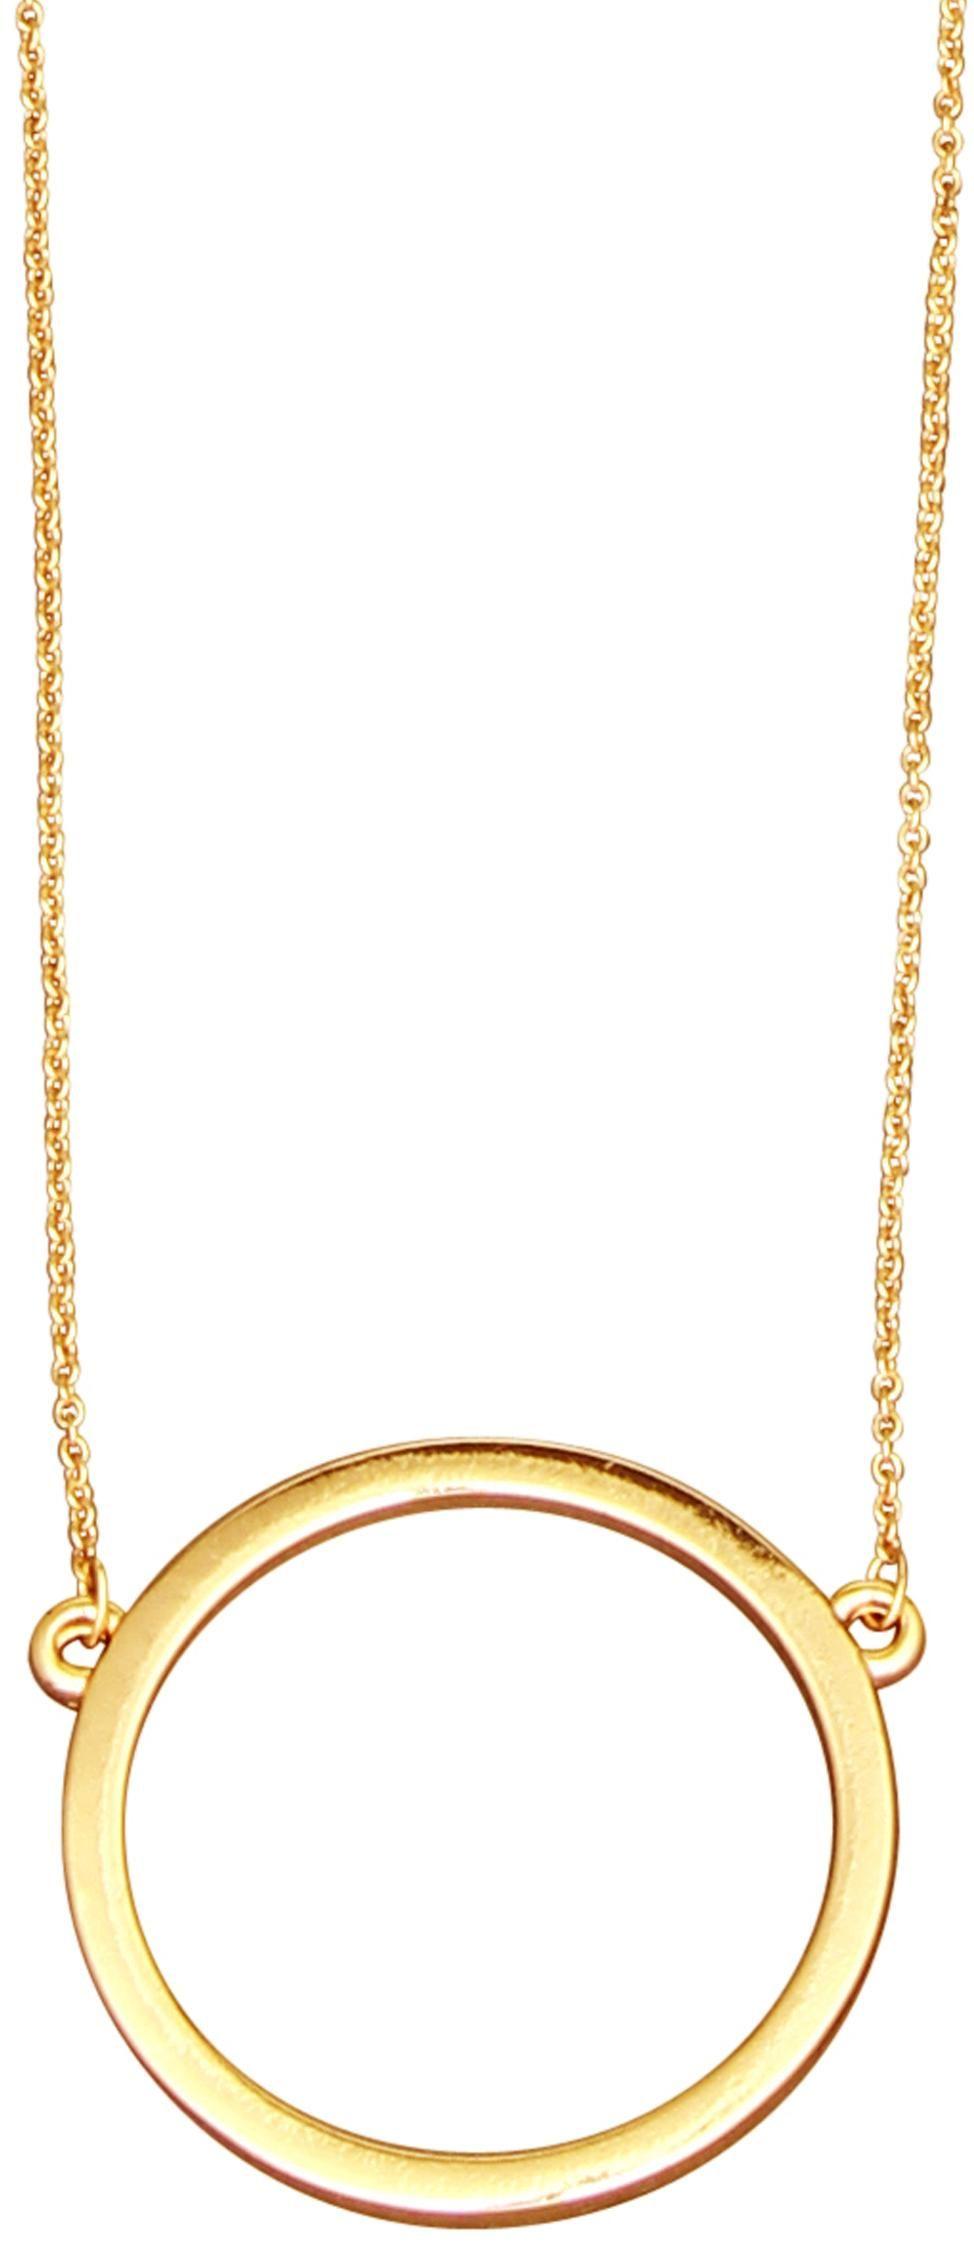 kette golden ring bijou brigitte online shop bijou briggite wishlist. Black Bedroom Furniture Sets. Home Design Ideas